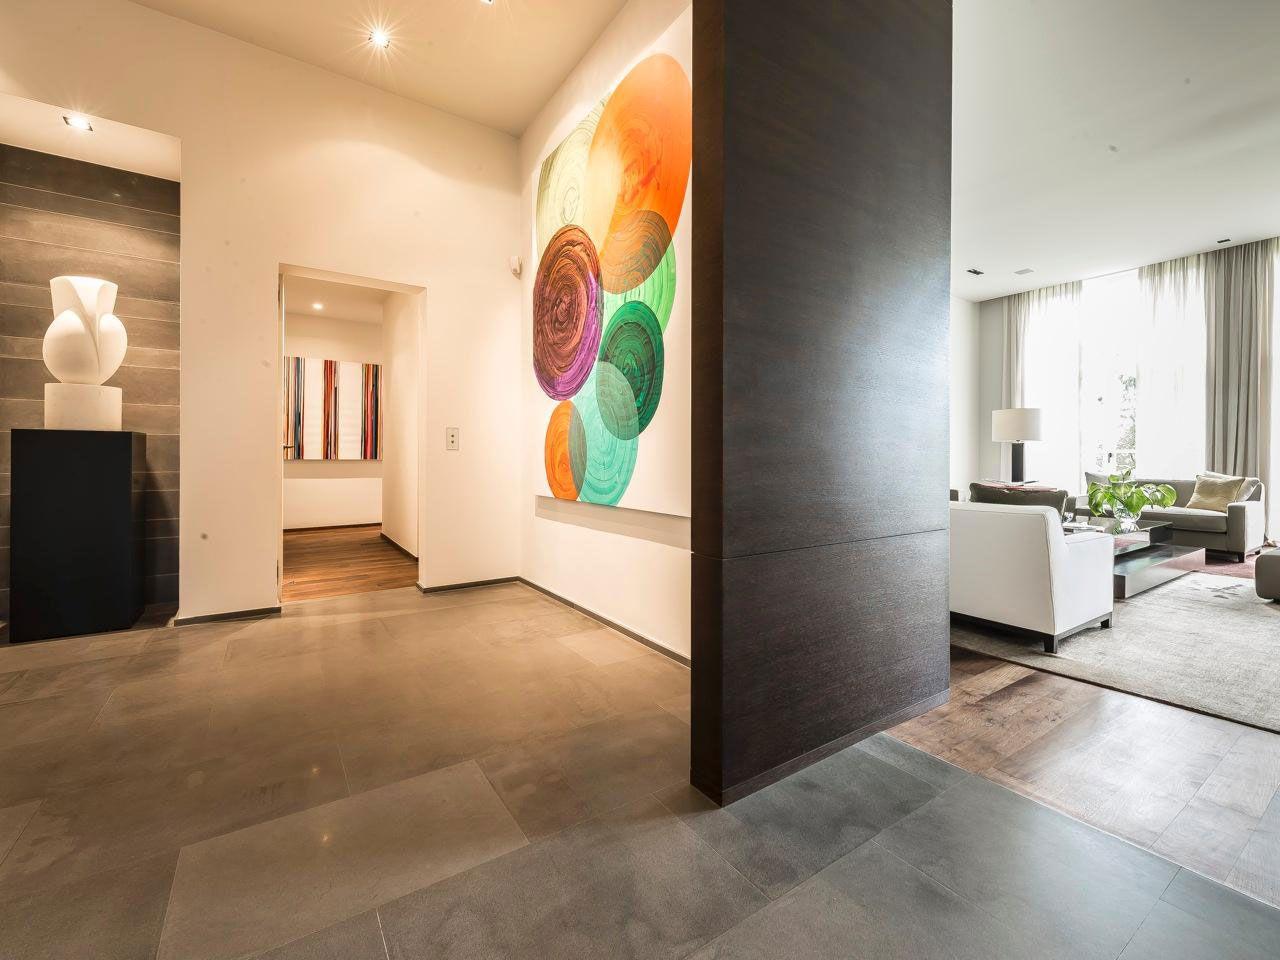 Chic Elegant Apartment in Brussels With Bright Interiors-06